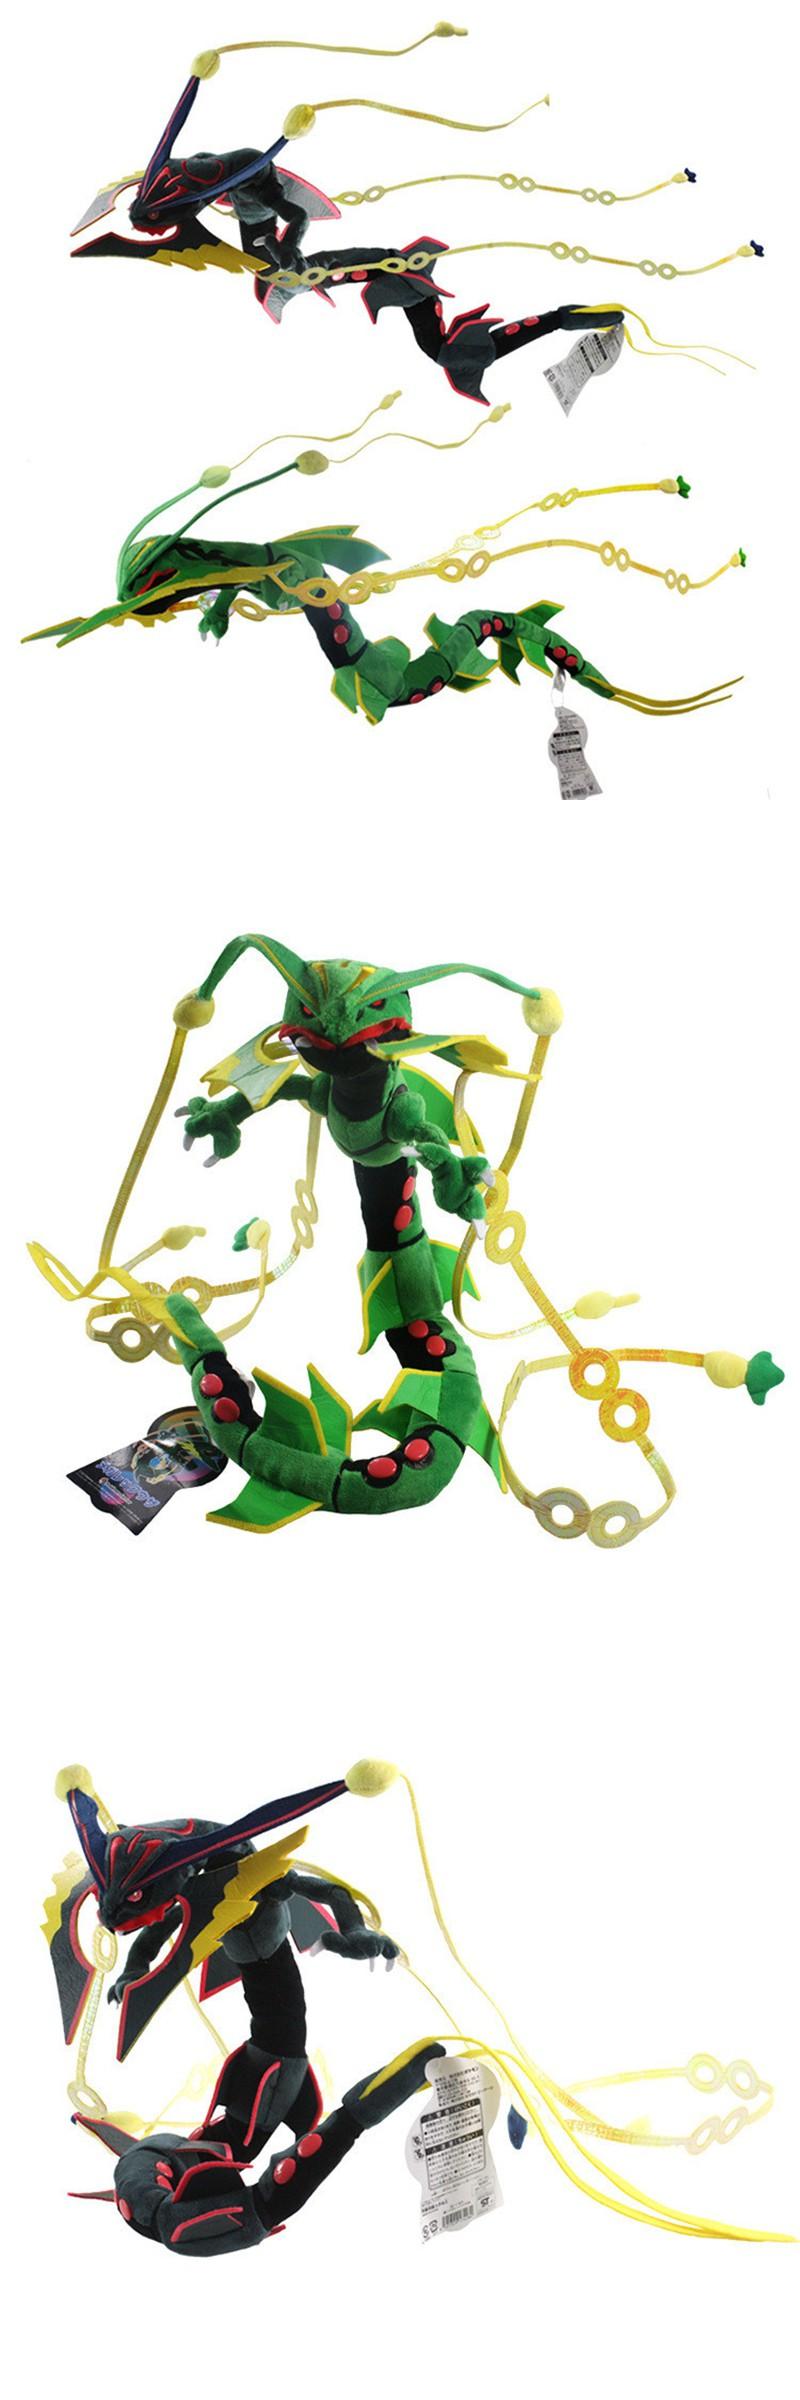 Hot sale cm pokemon plush toy xy mega ruby rayquaza dragon soft